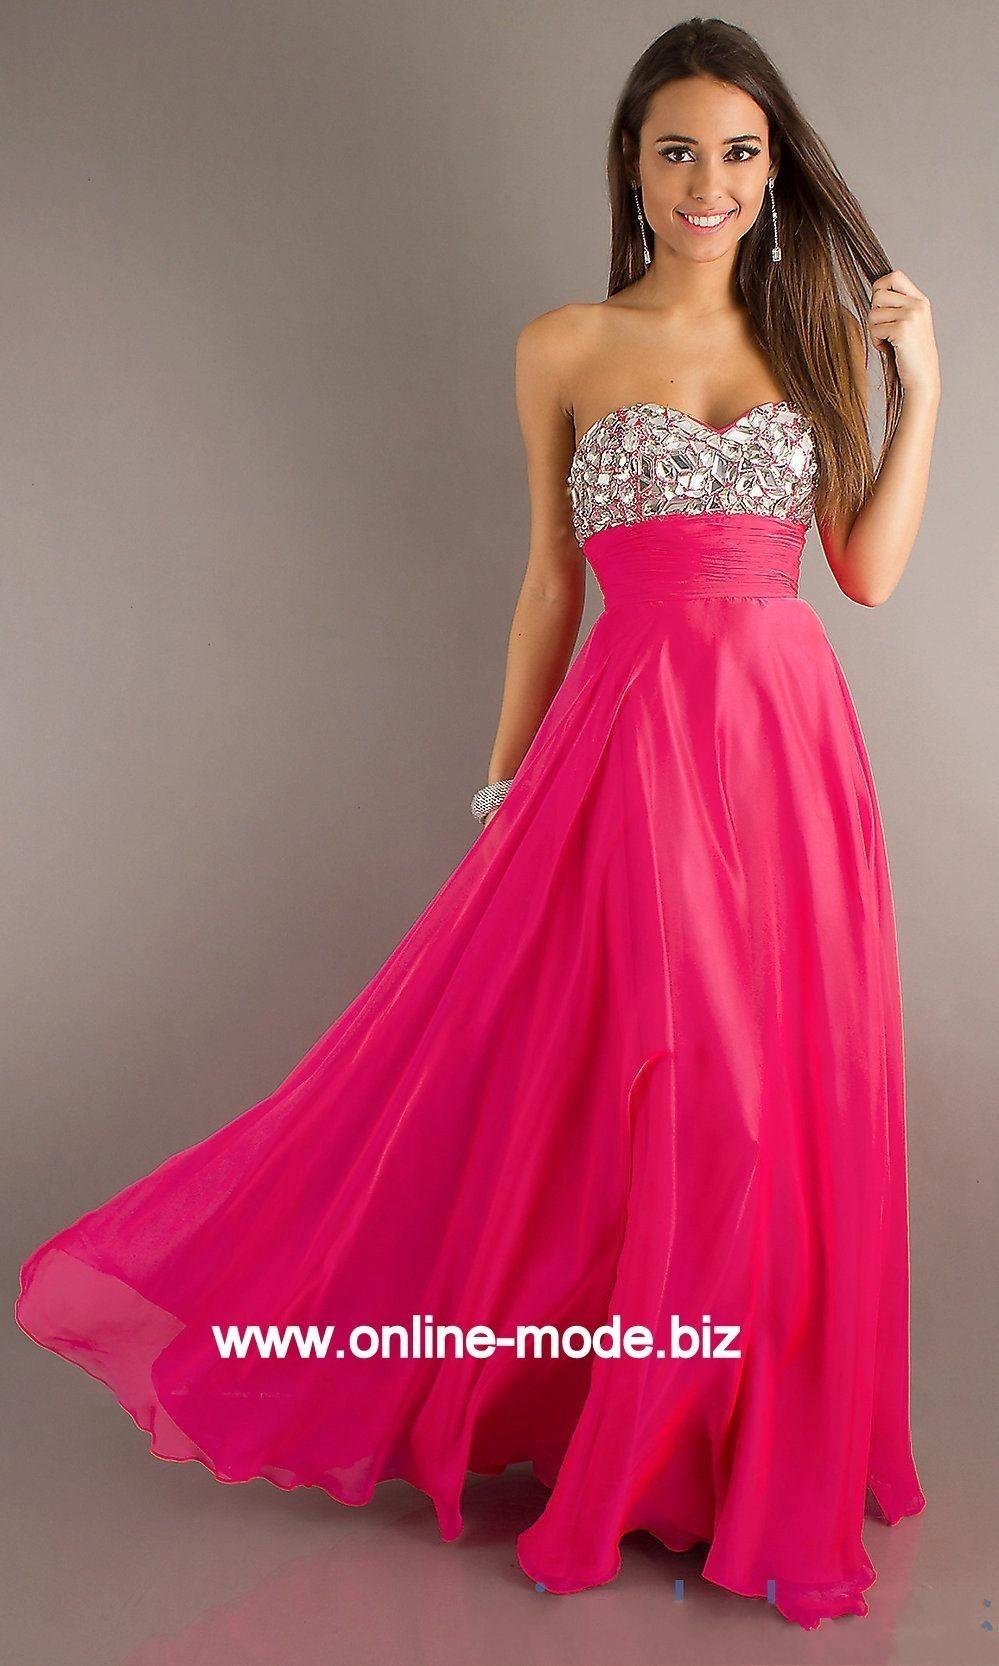 17 Spektakulär Abendkleider Lang Pink DesignAbend Schön Abendkleider Lang Pink Bester Preis